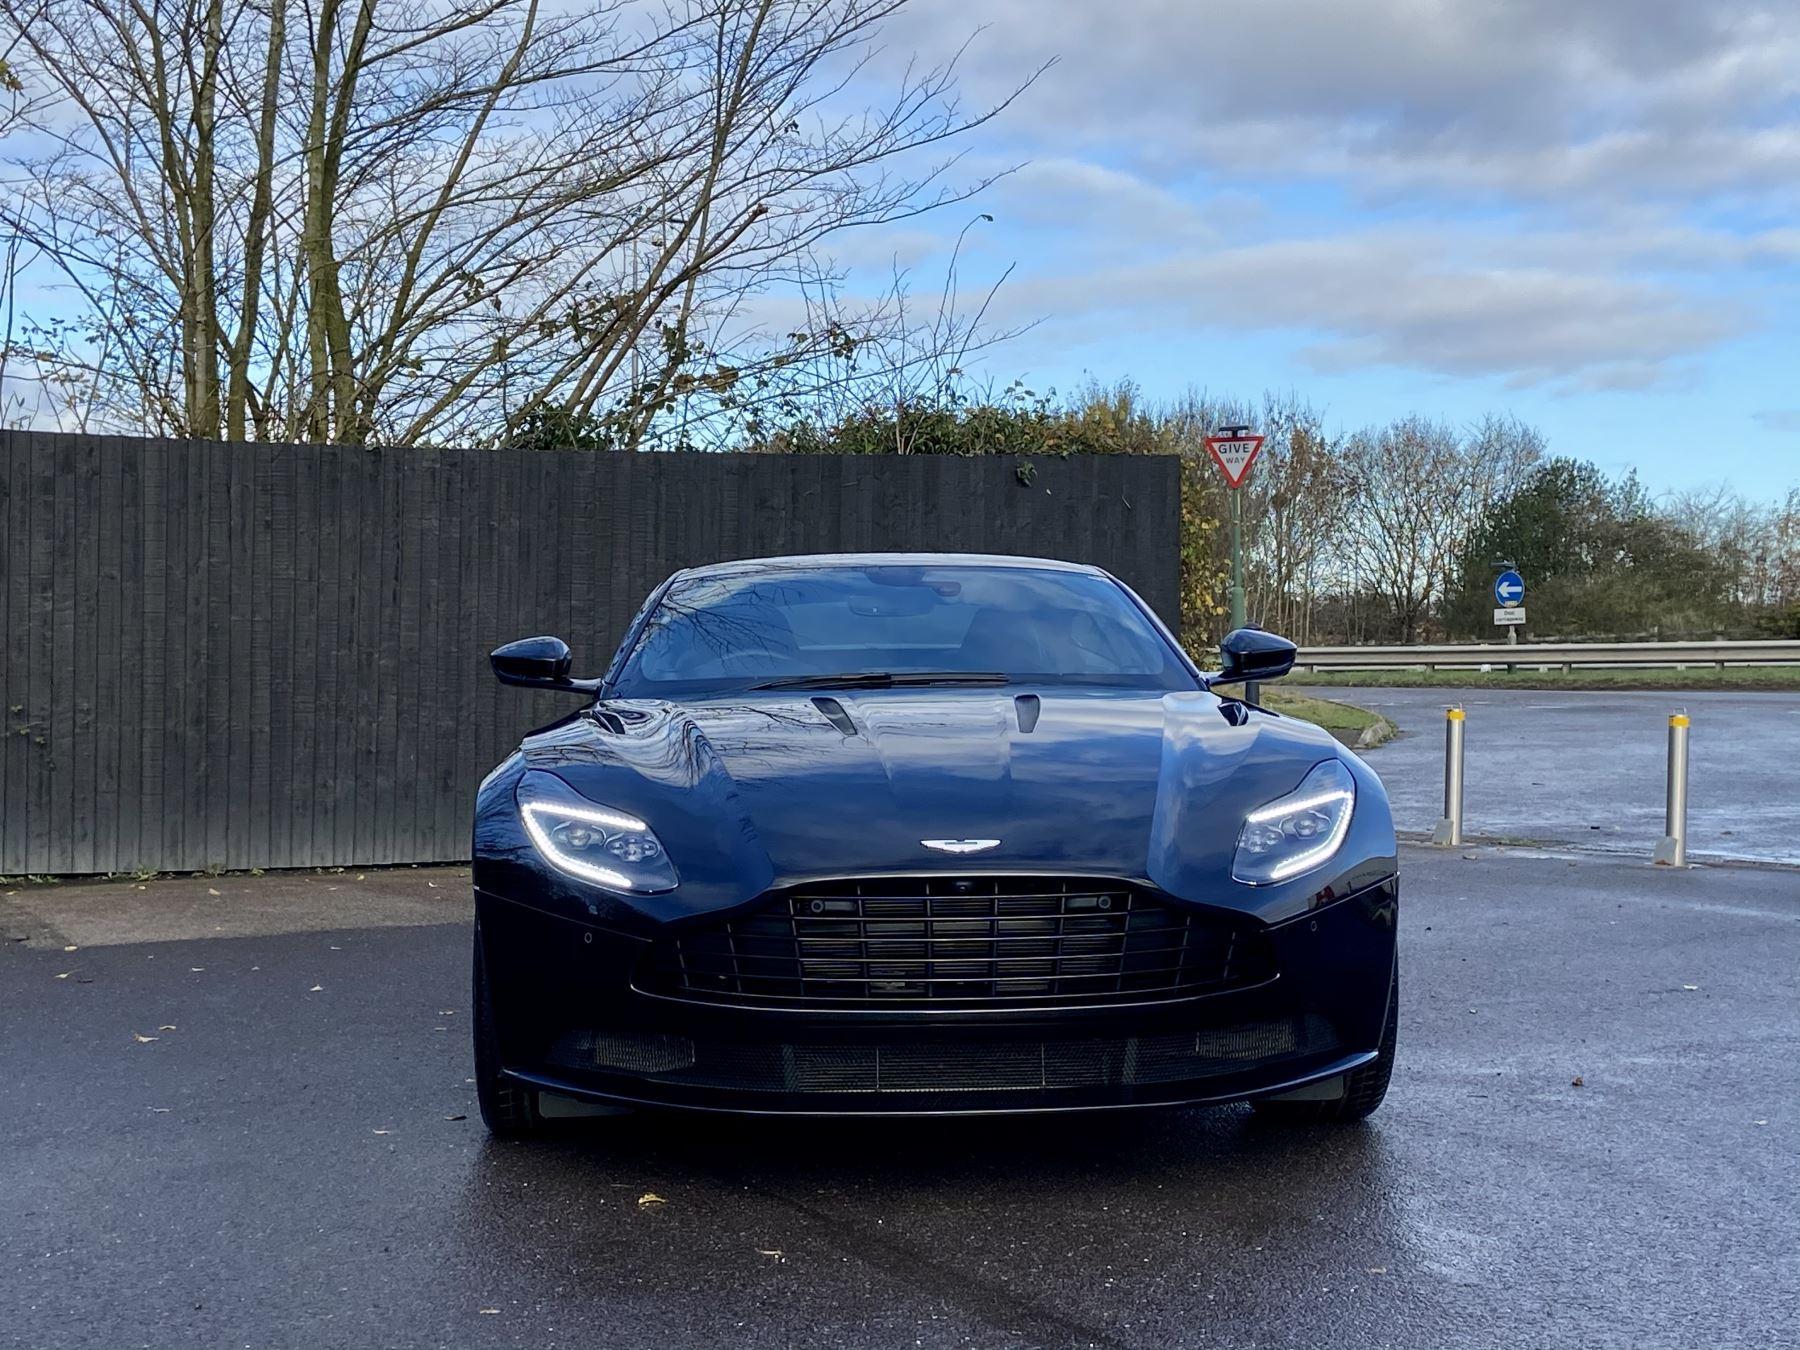 Aston Martin DB11 V12 AMR Touchtronic image 2